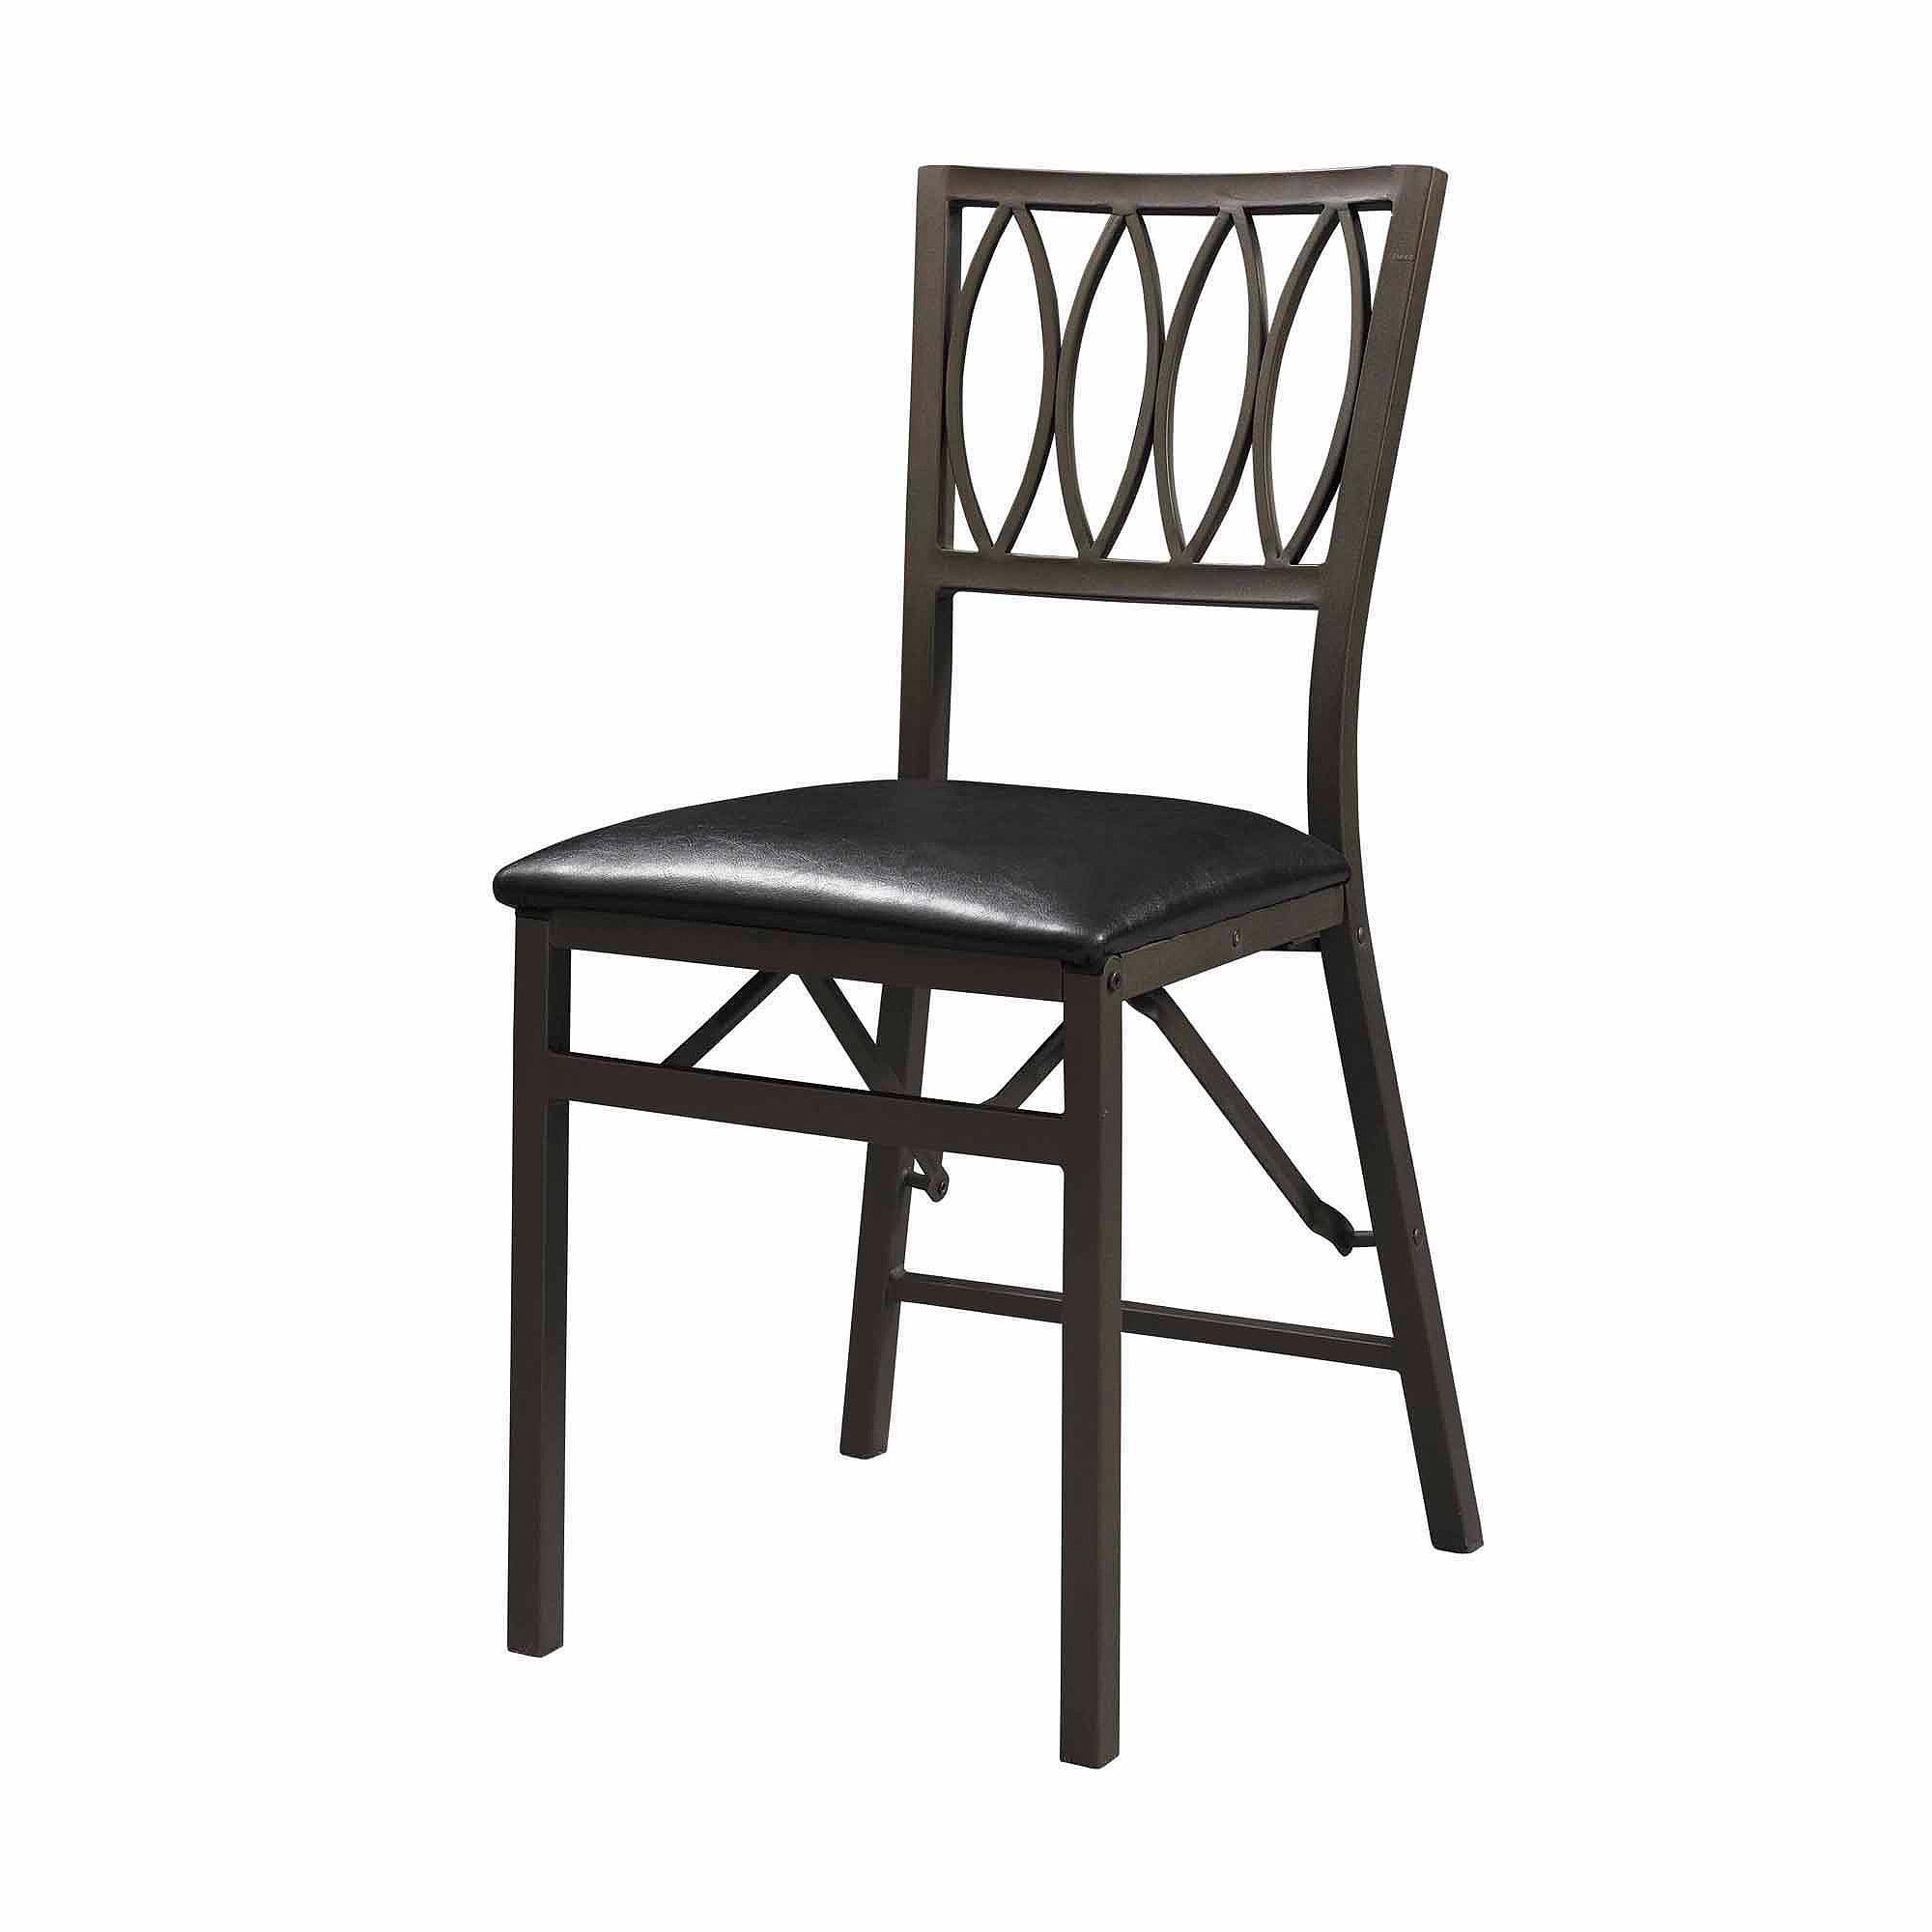 SEI Arista Oval Design Folding Set of 2 Chairs